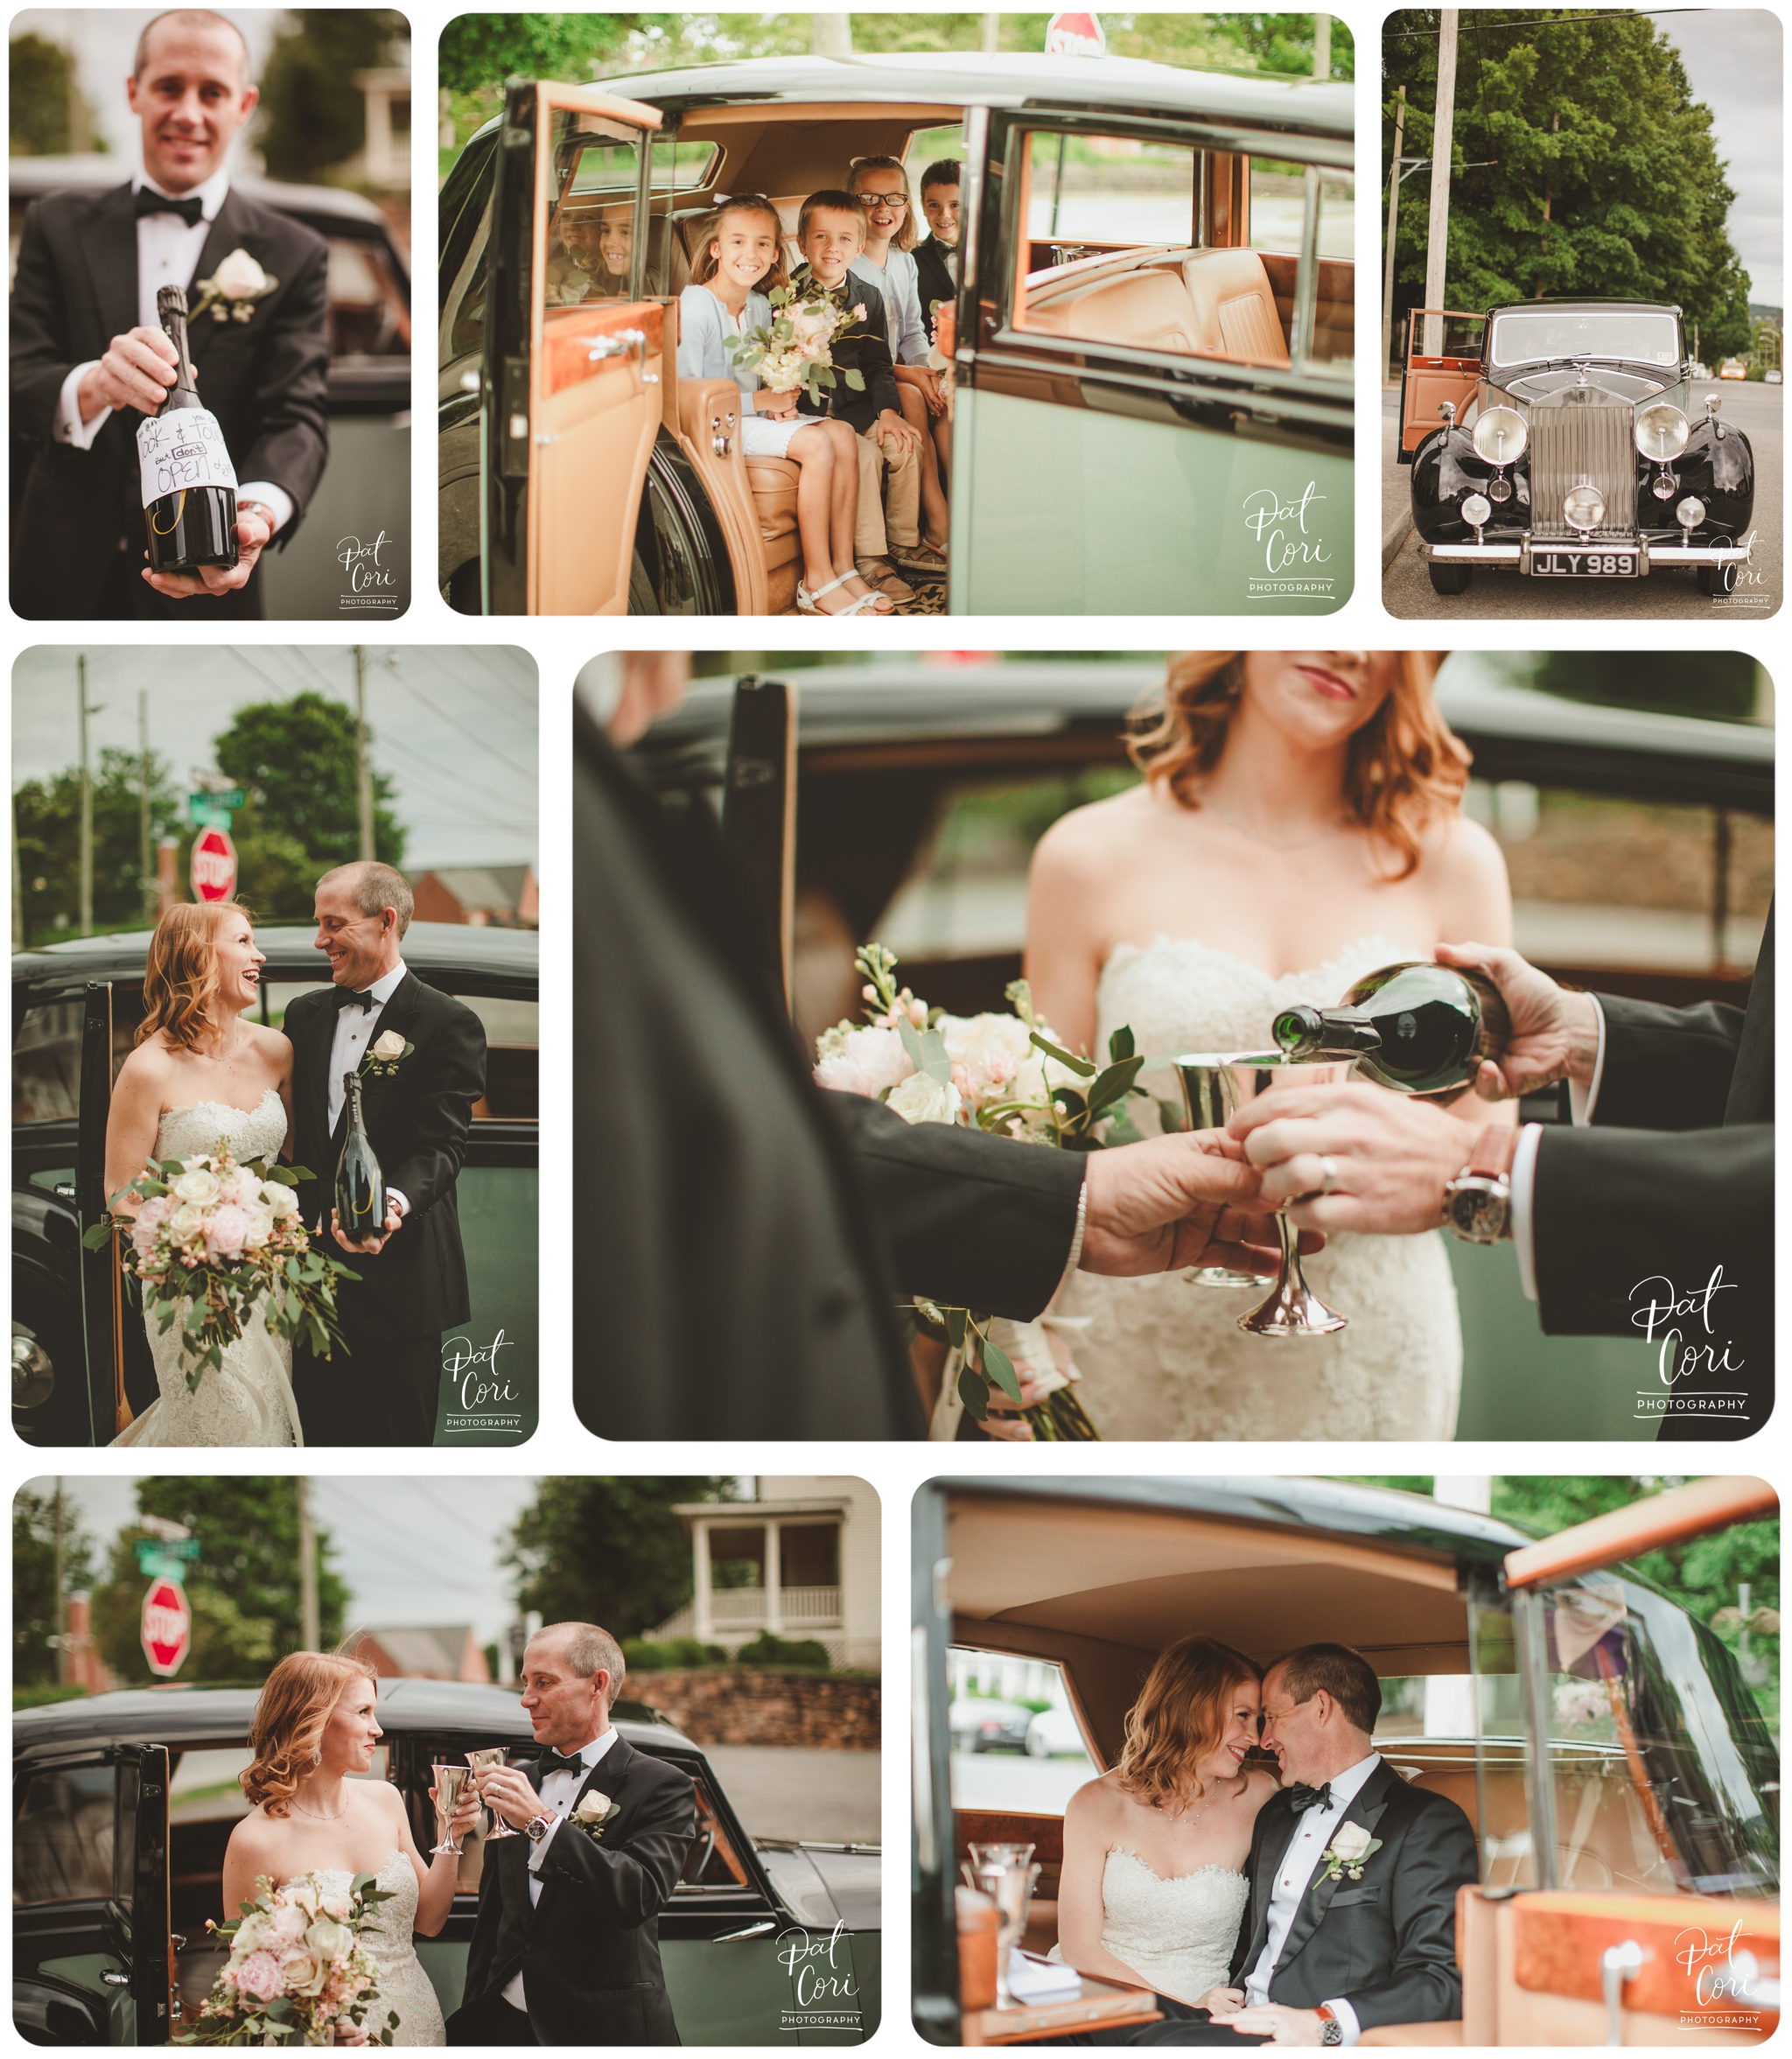 JenniferJim-Collage-09.jpg